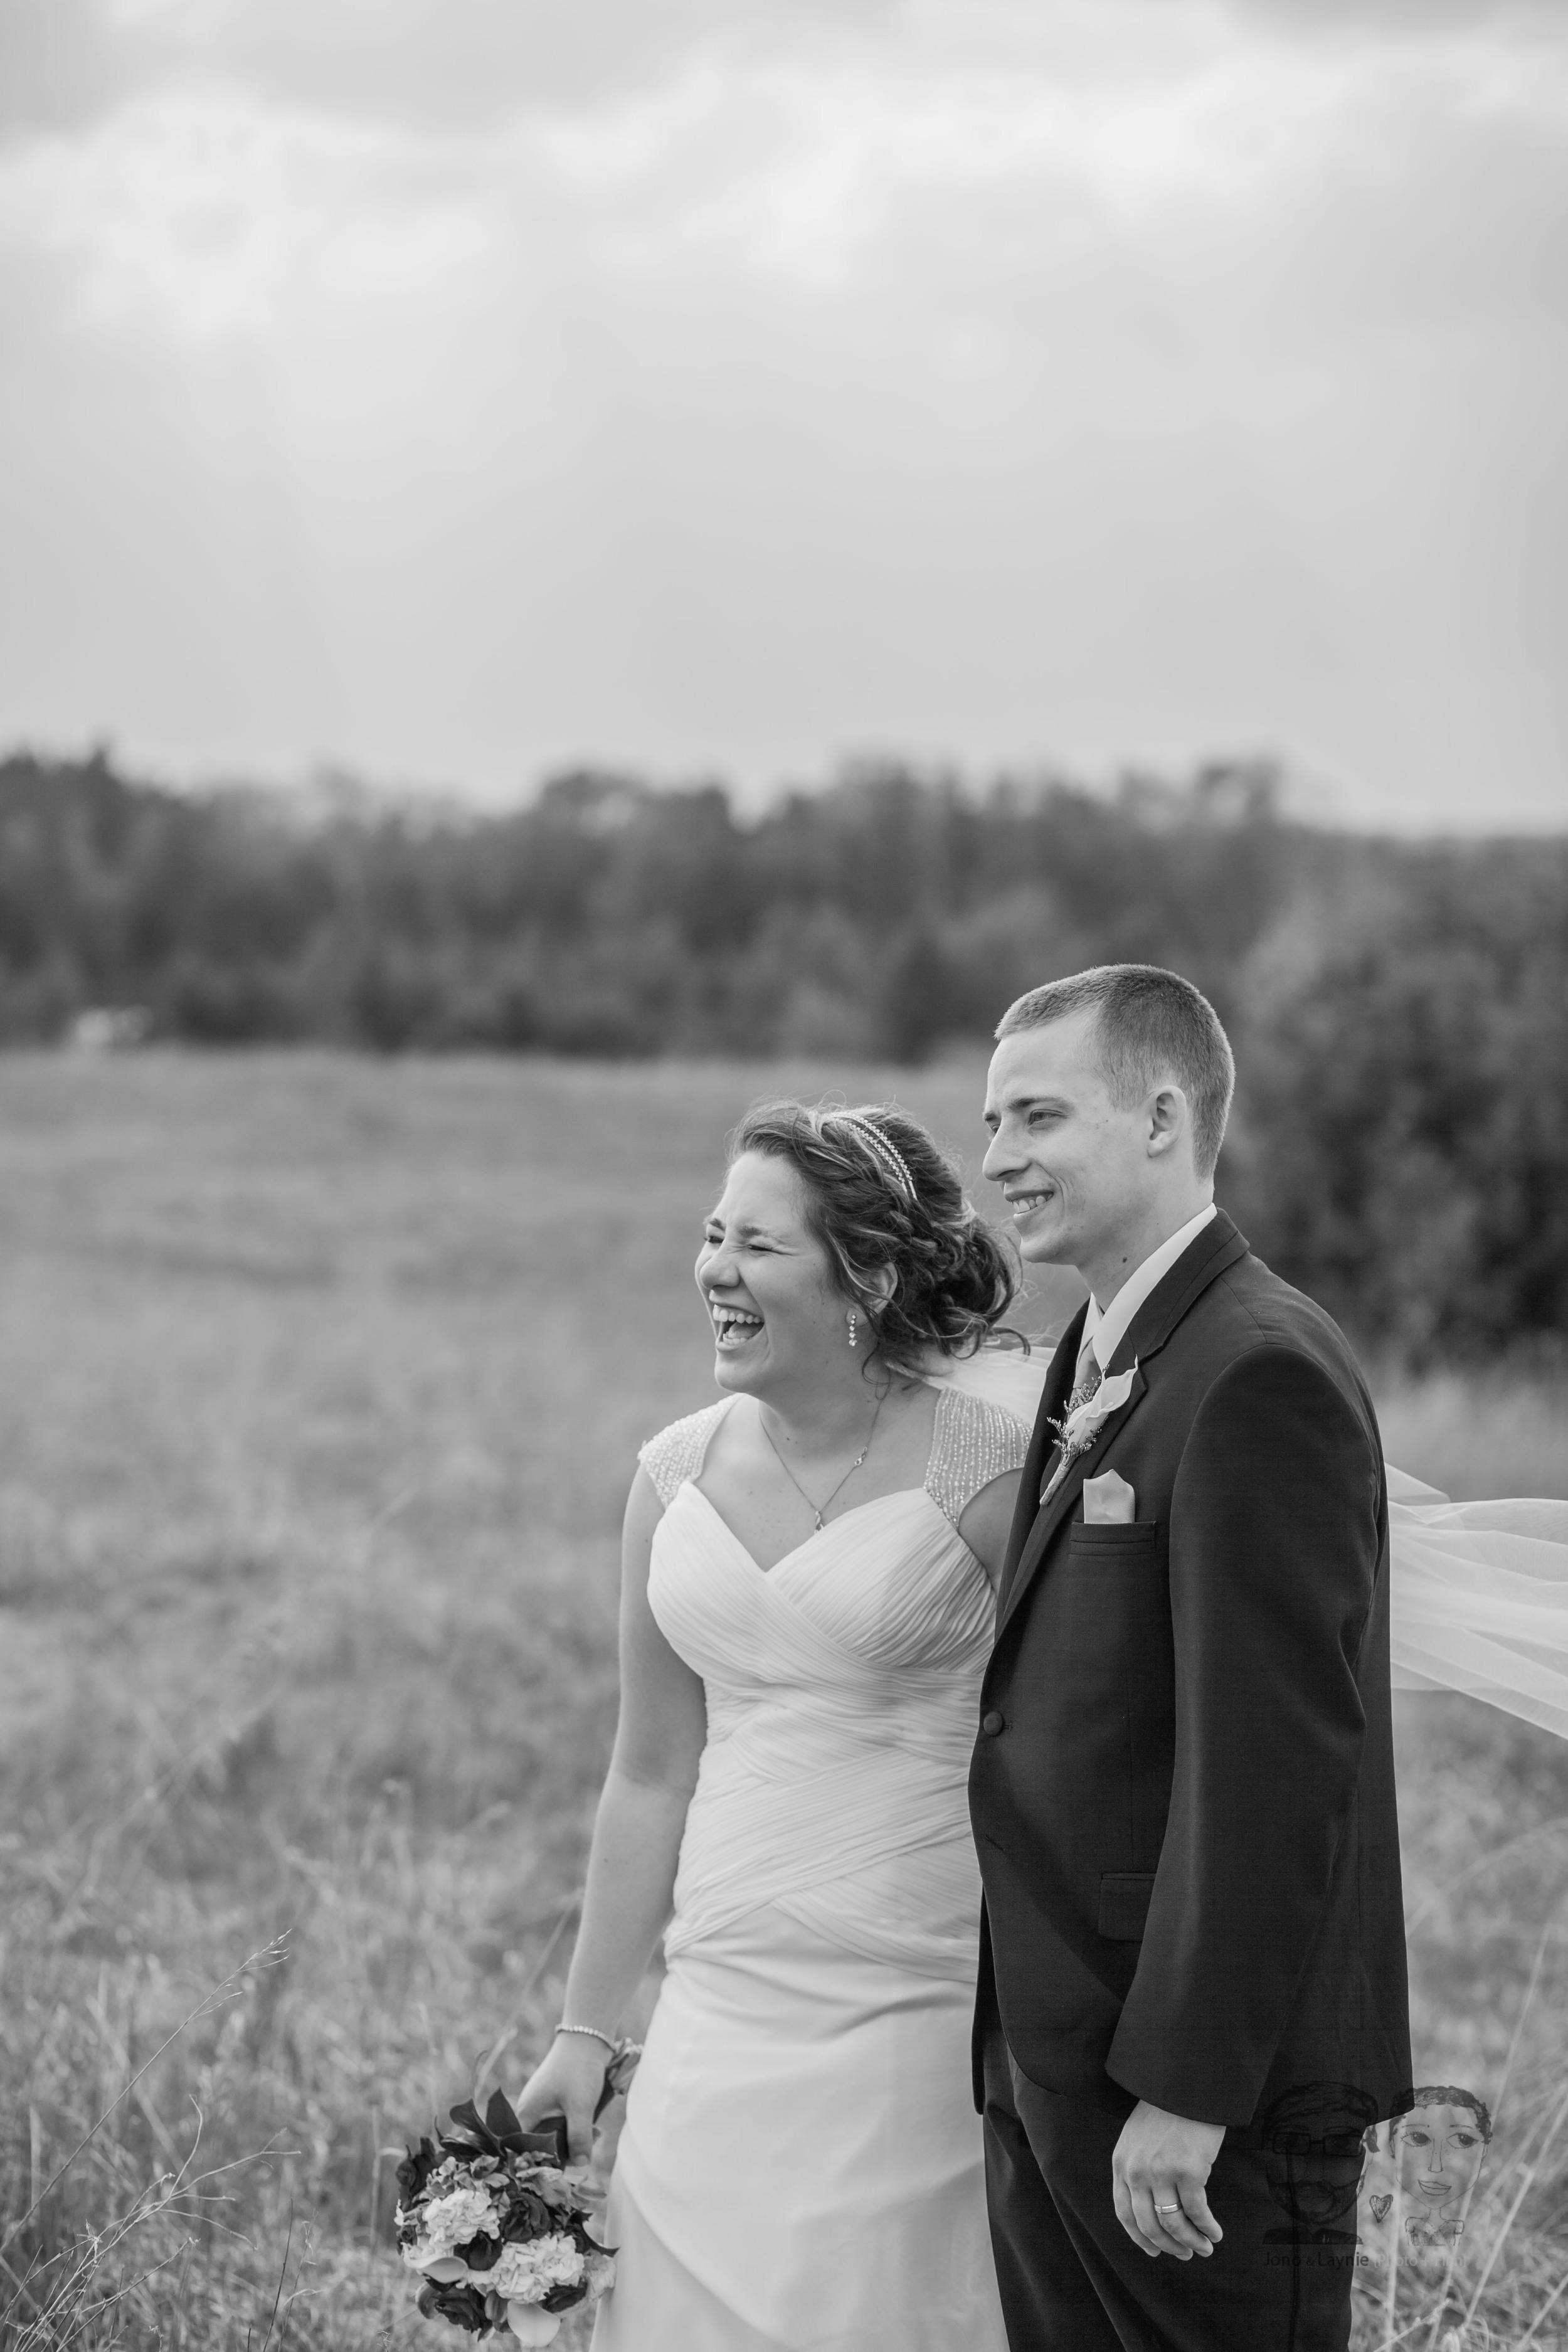 38Toronto Wedding Photographers and Videographers-Jono & Laynie Co.-Orangeville Wedding.jpg